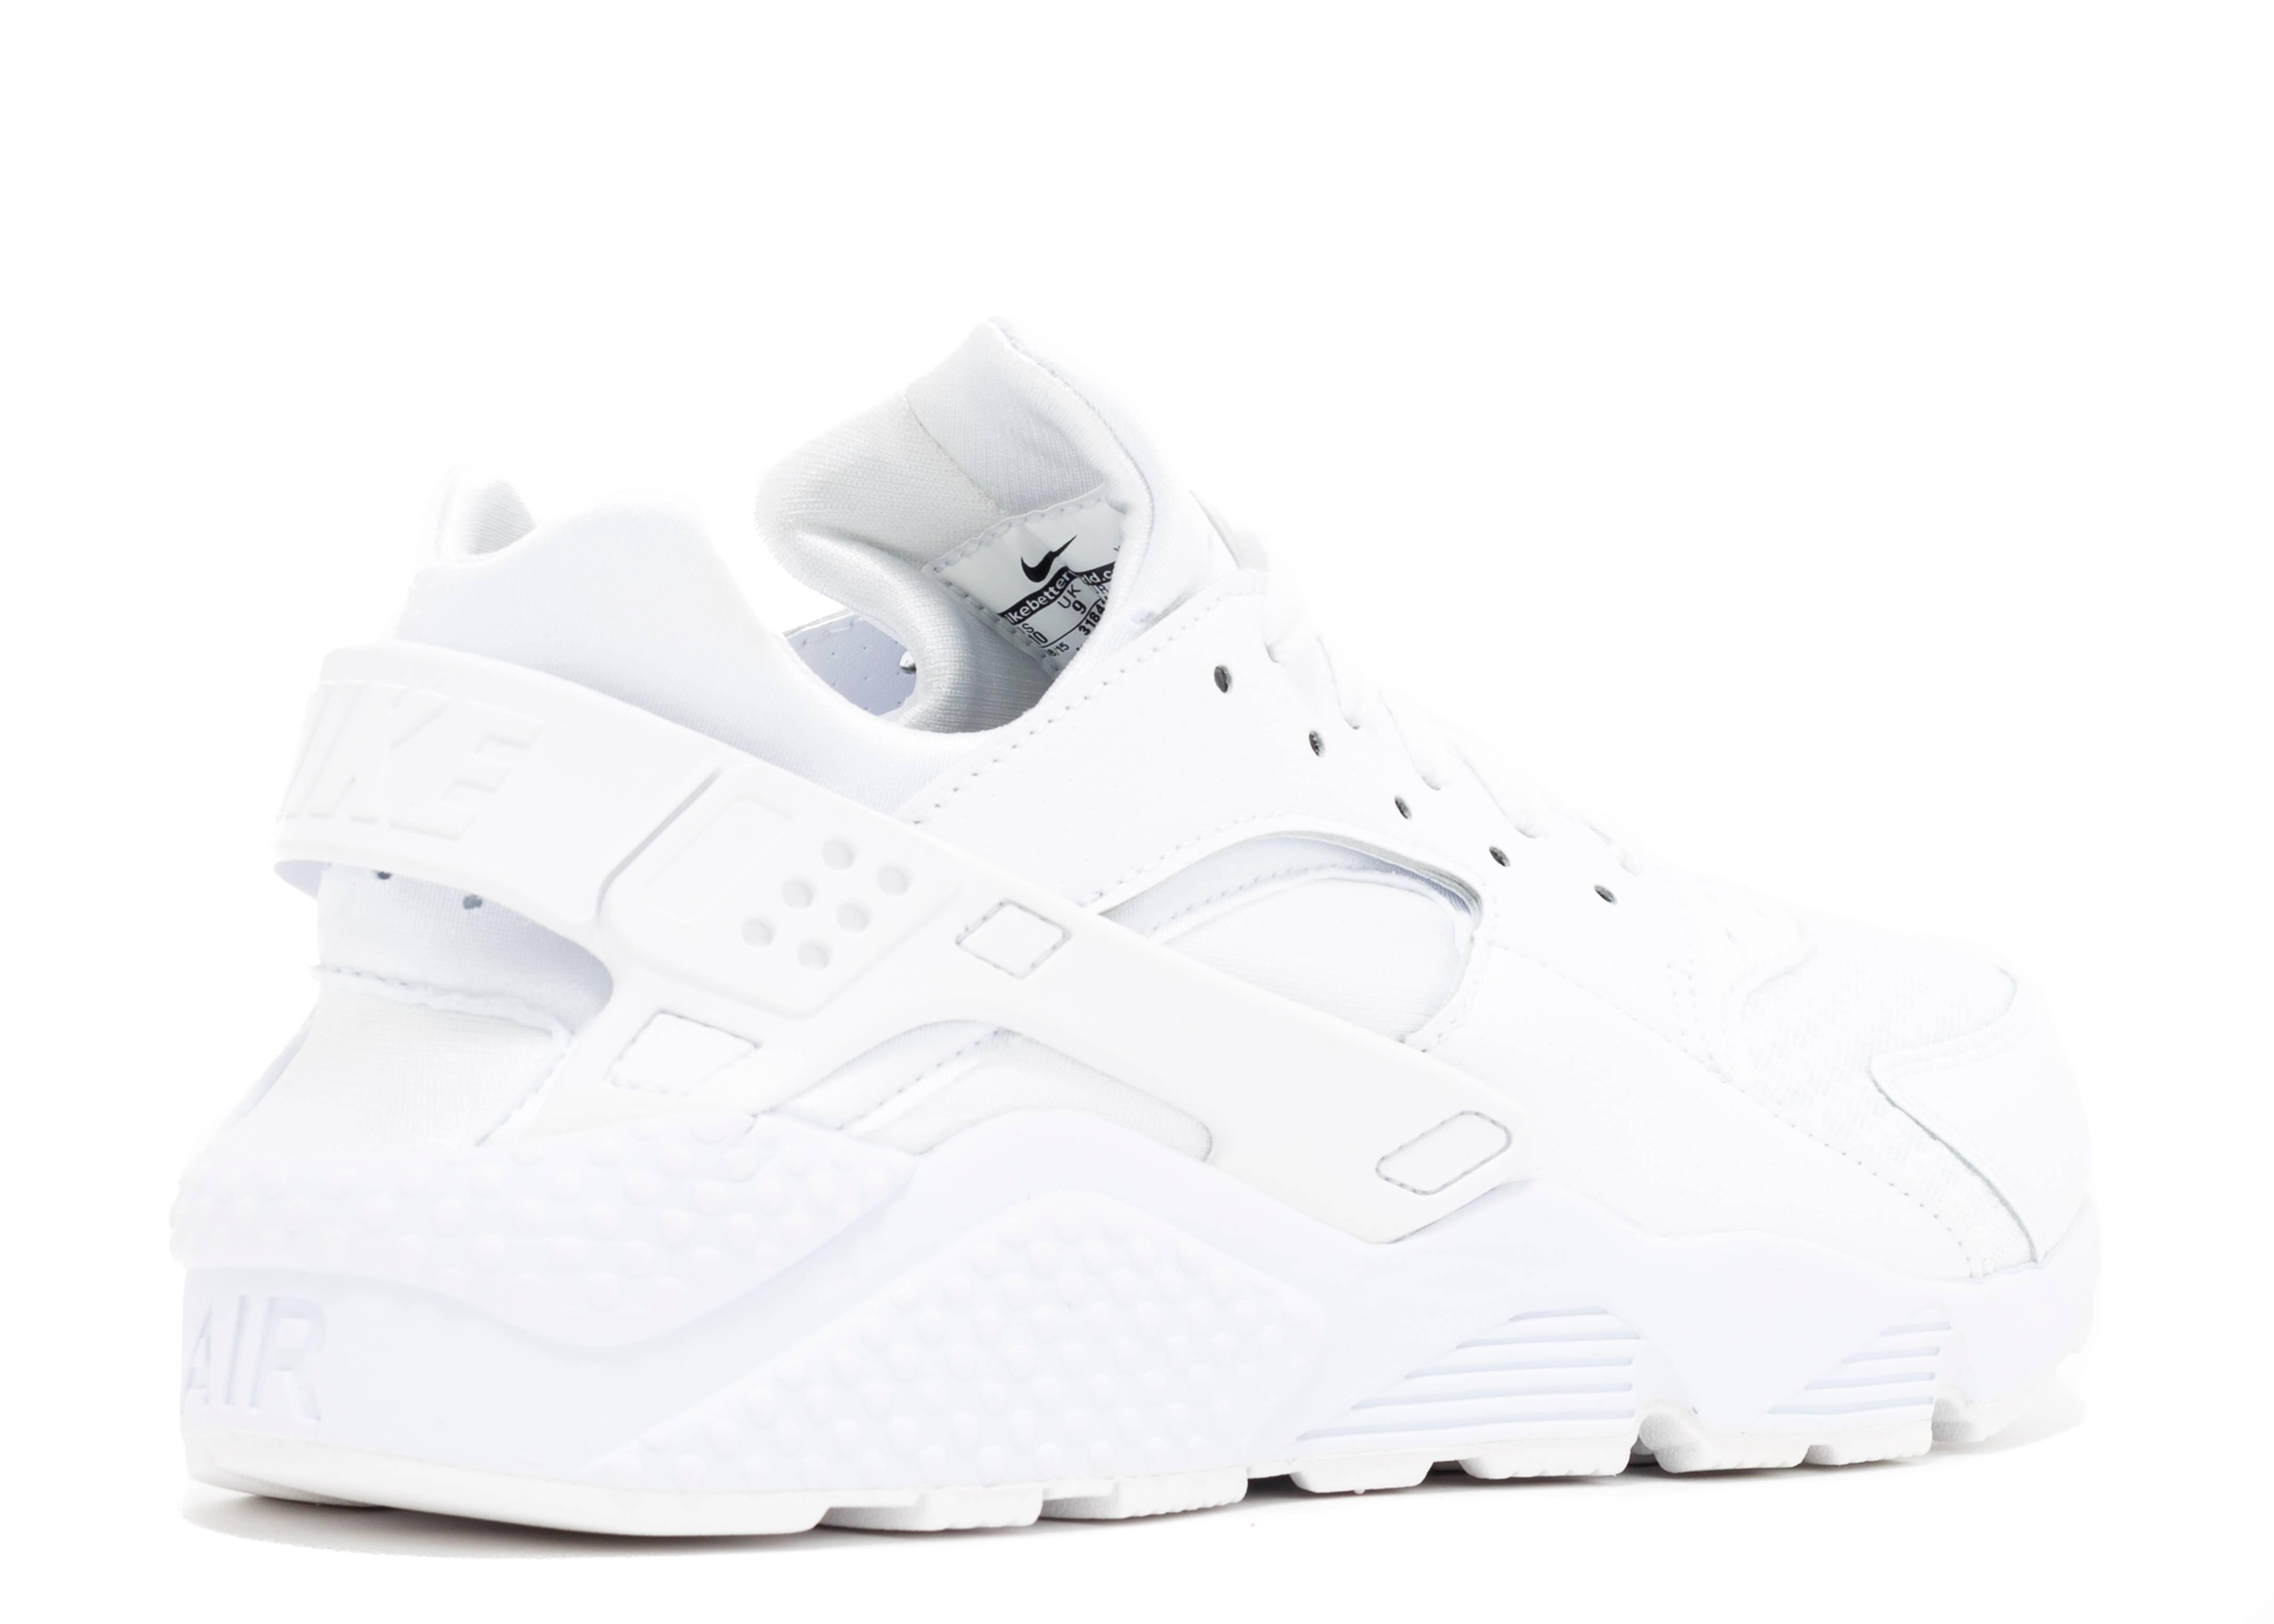 on sale 2fbd1 c7395 air huarache nike 318429 111 white white pure platinum flight club